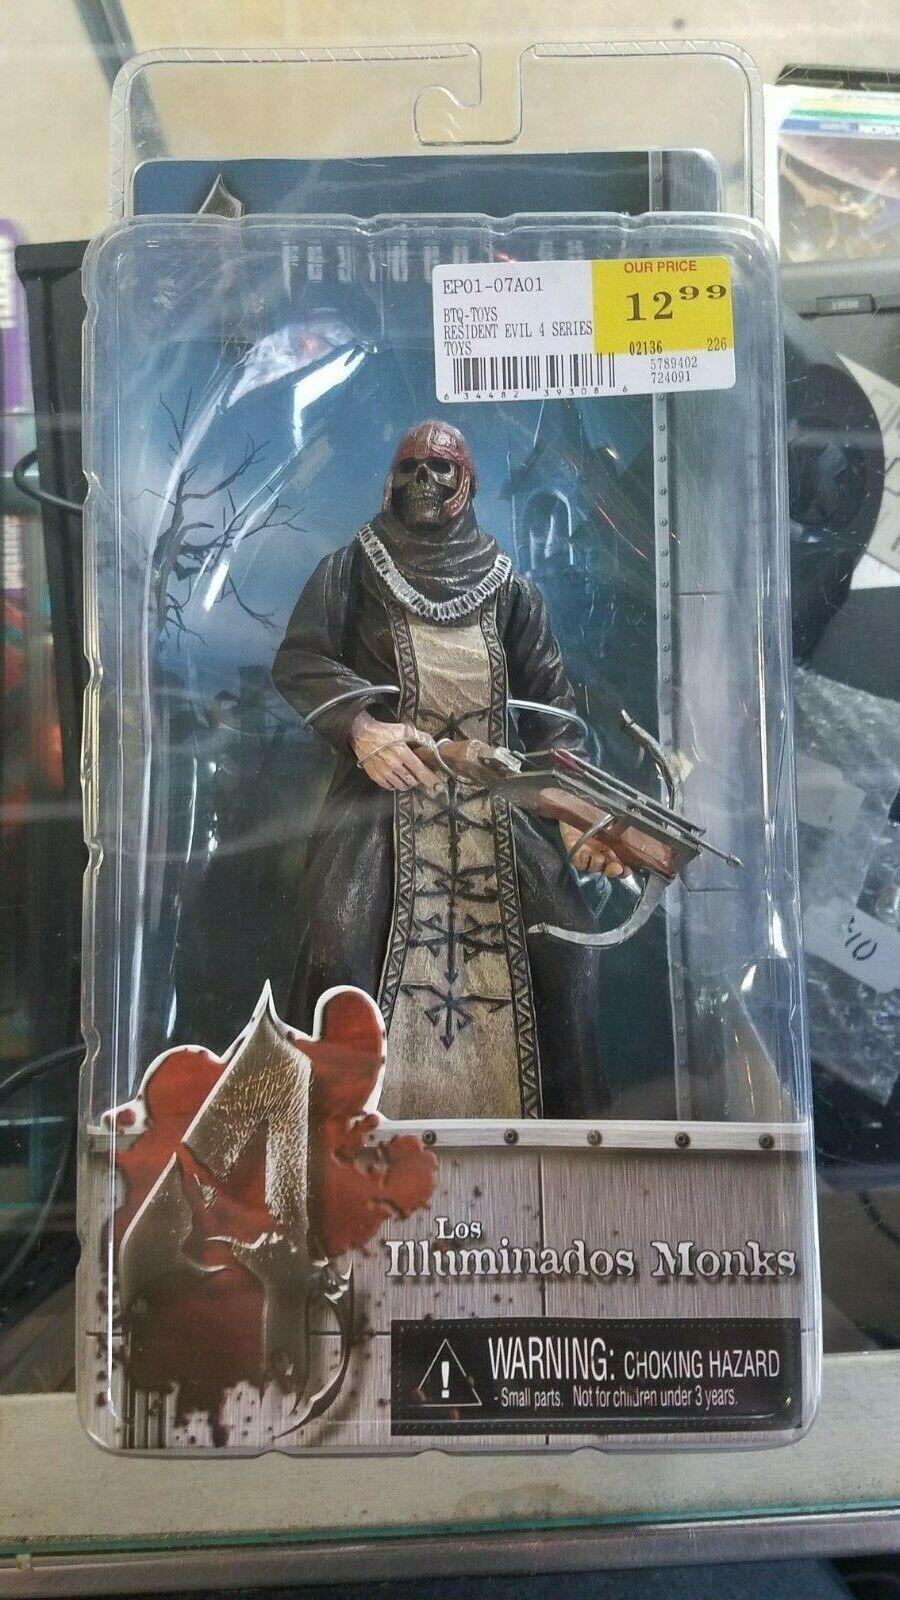 Resident Evil 4 Action Figure  Los Illuminados Monks -New, Unopened NECA (braun)